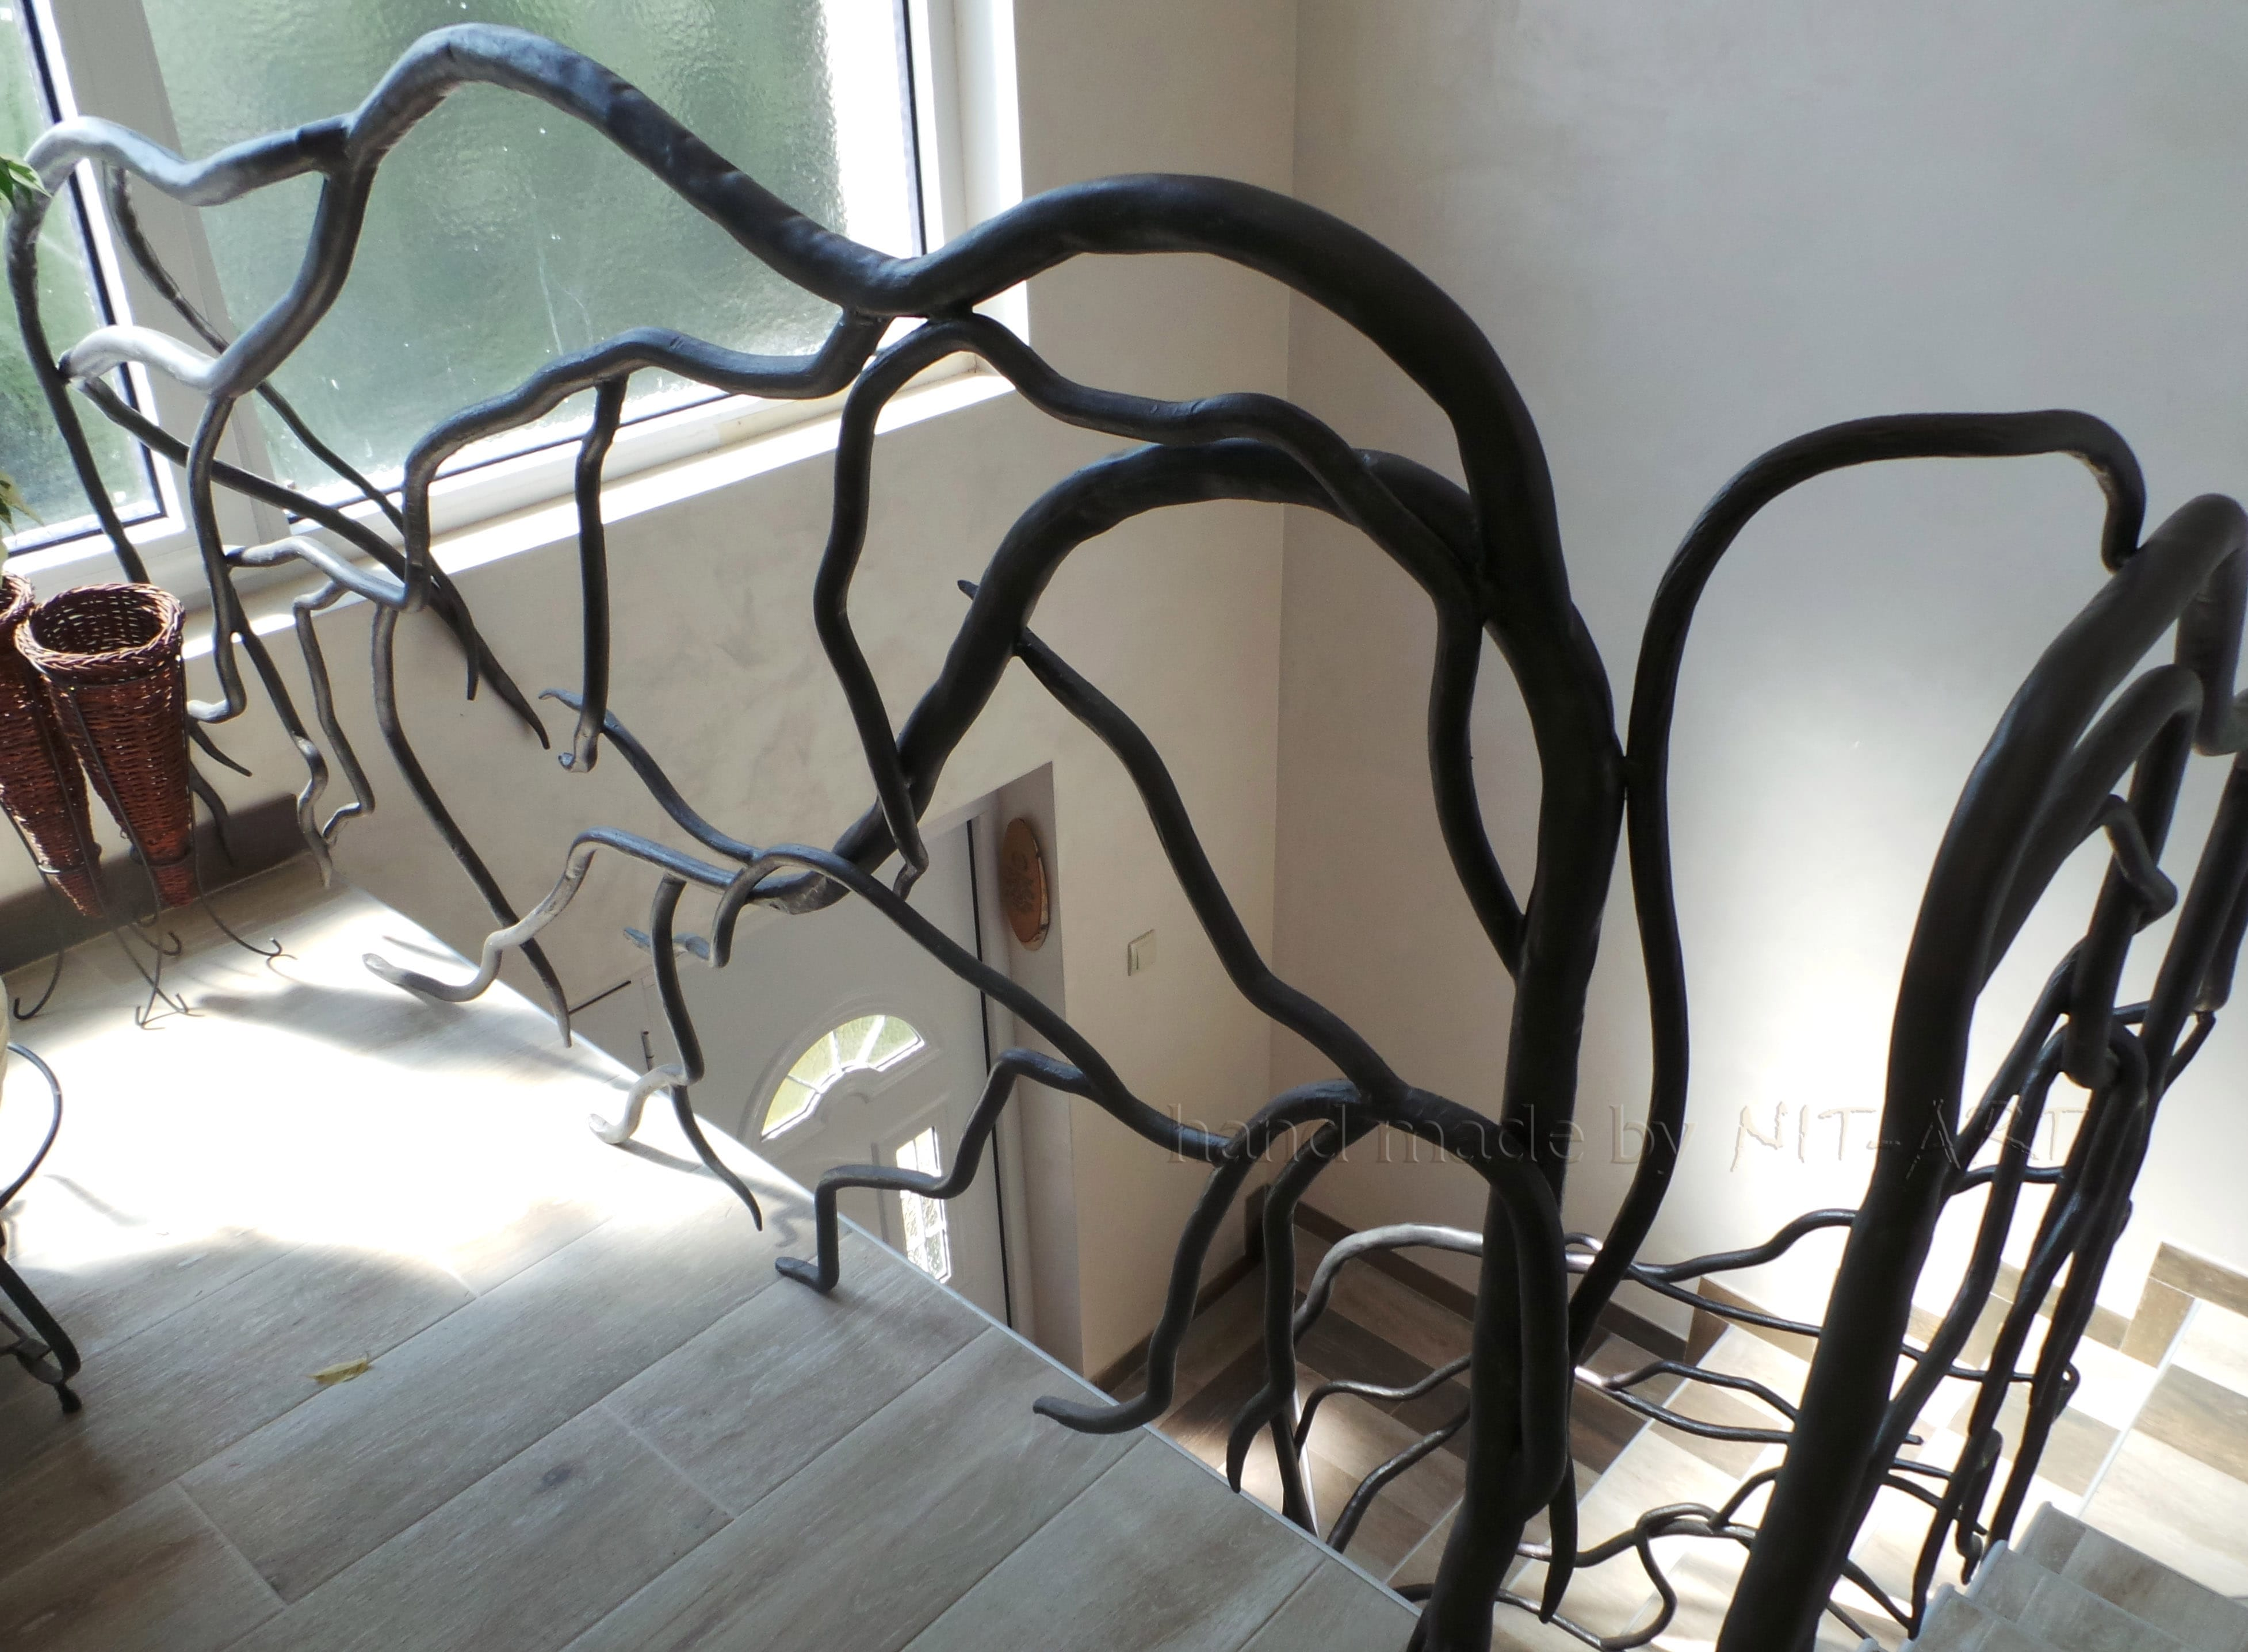 NIT-ART Kovane ograde